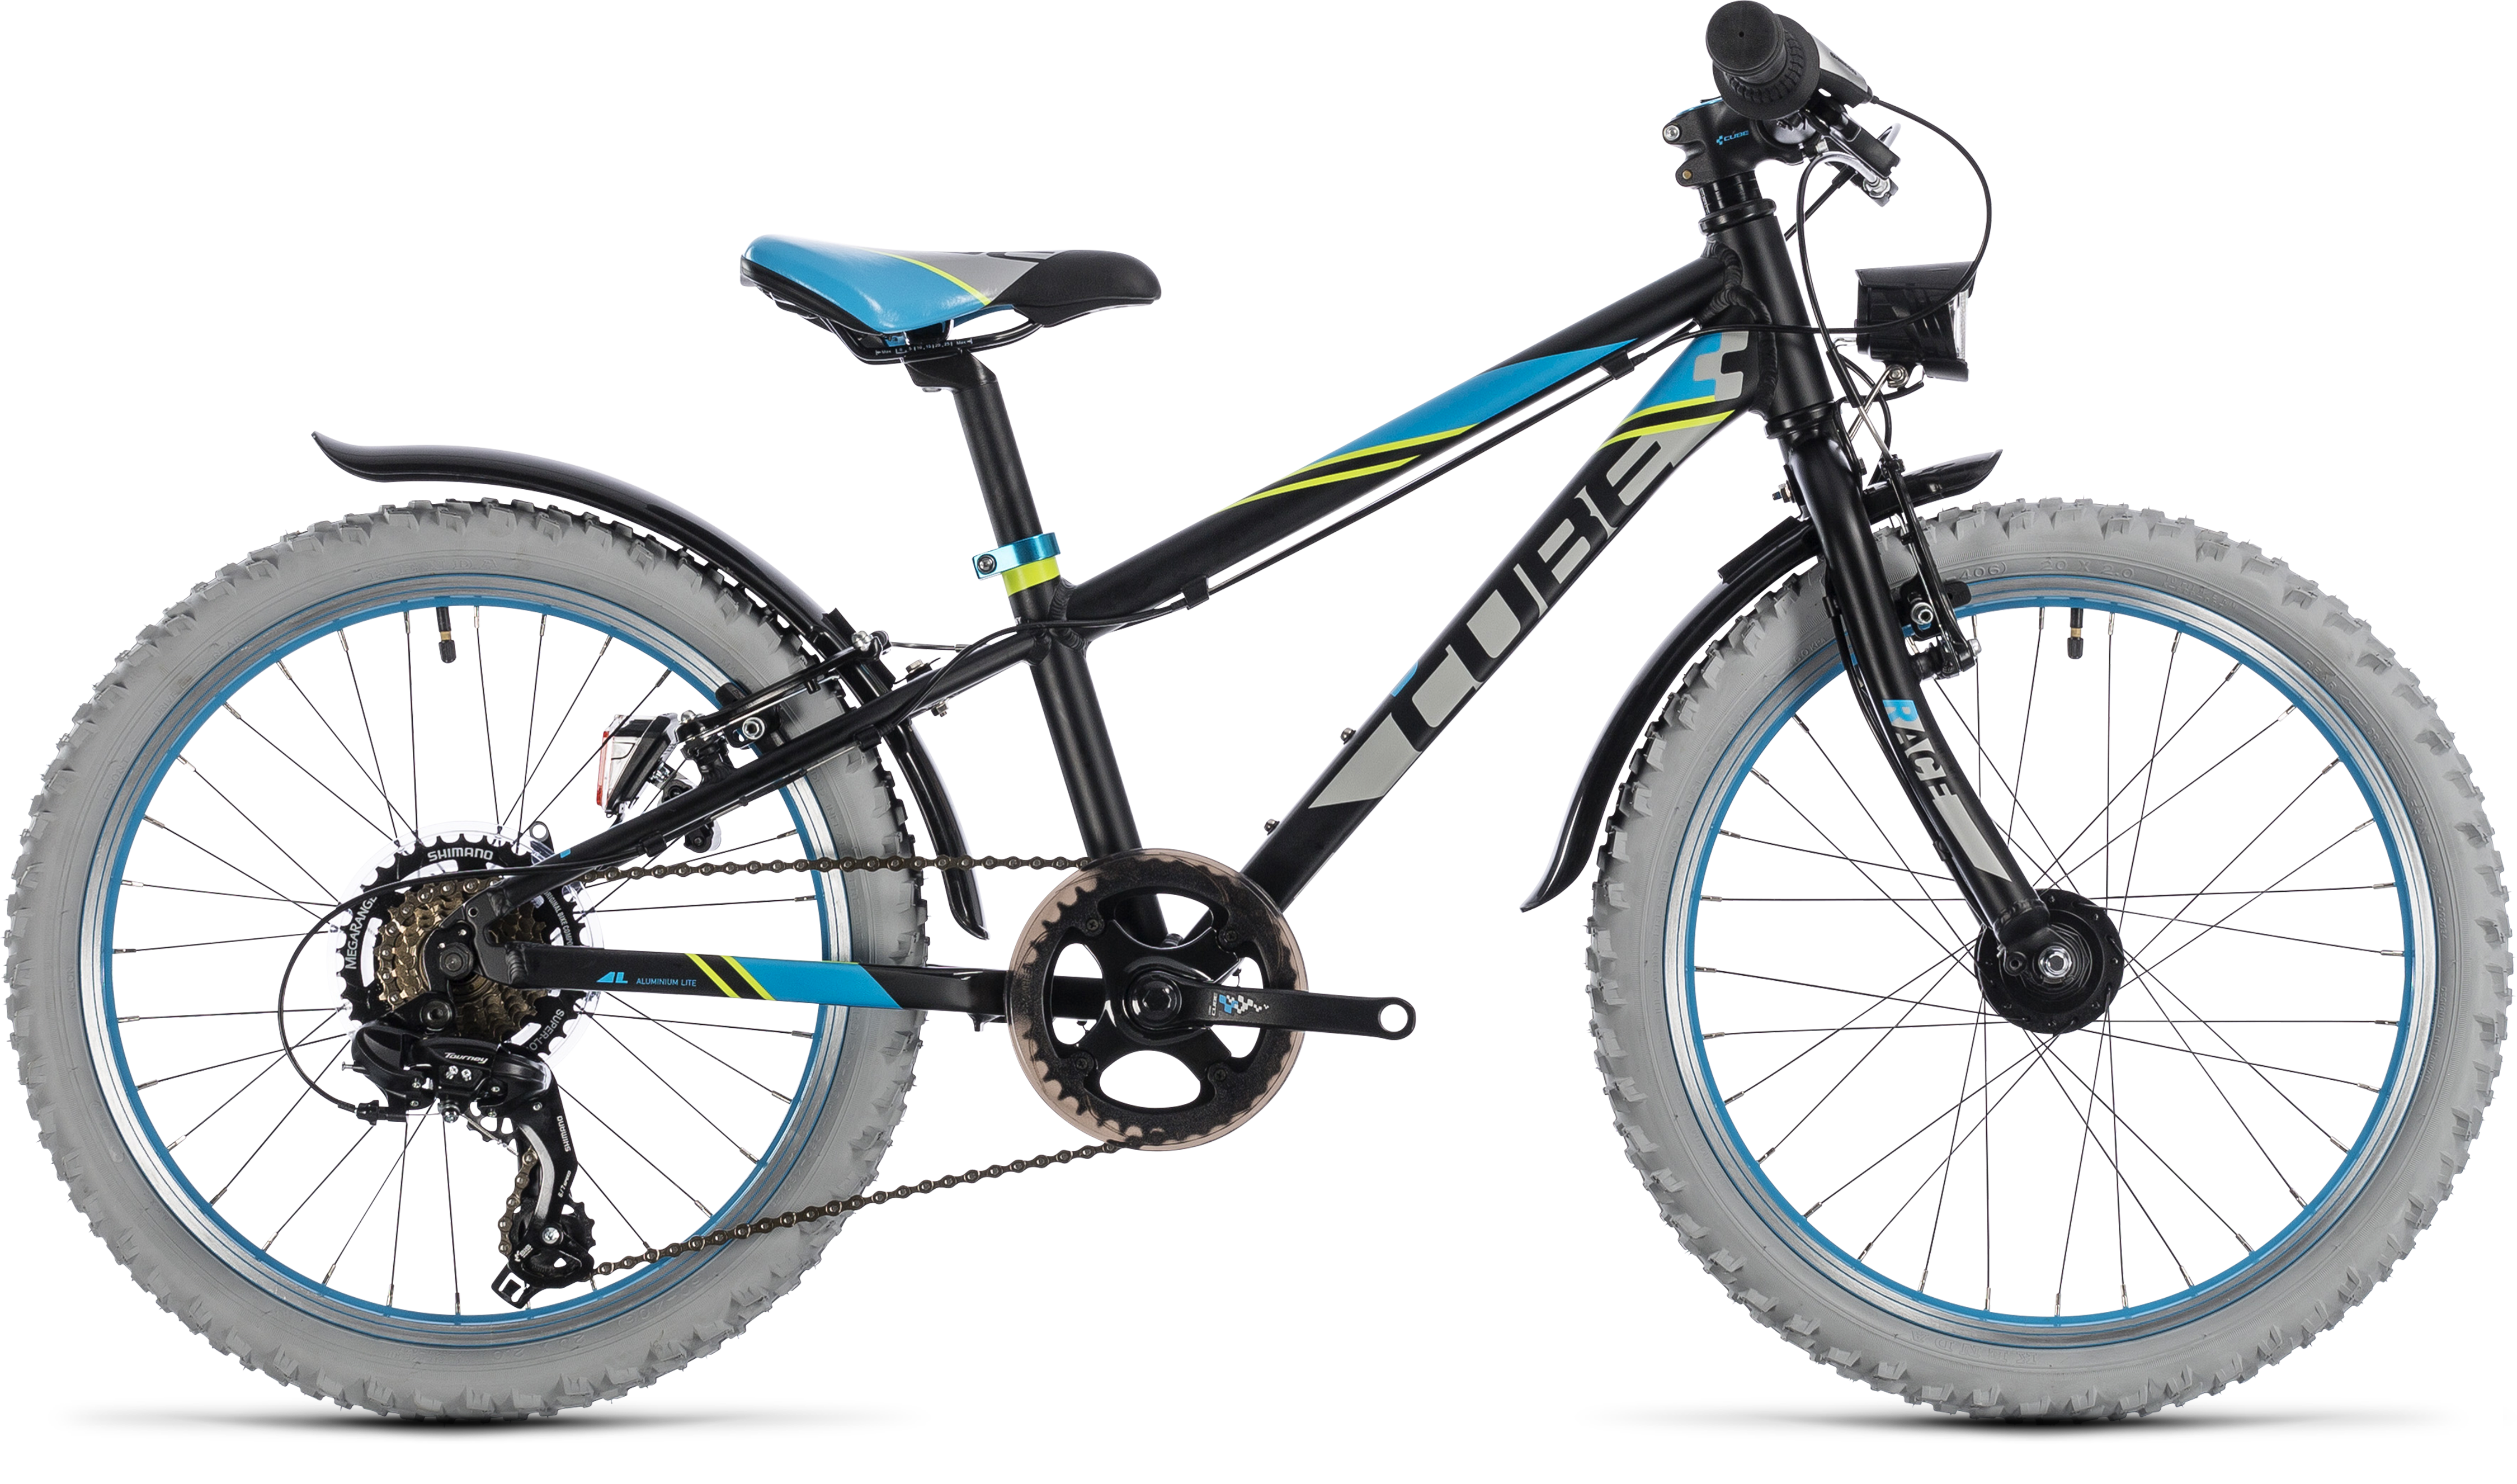 654461fd1ca 2018 Cube Kid 200 Allroad Mountain Bike Black Blue £324.00